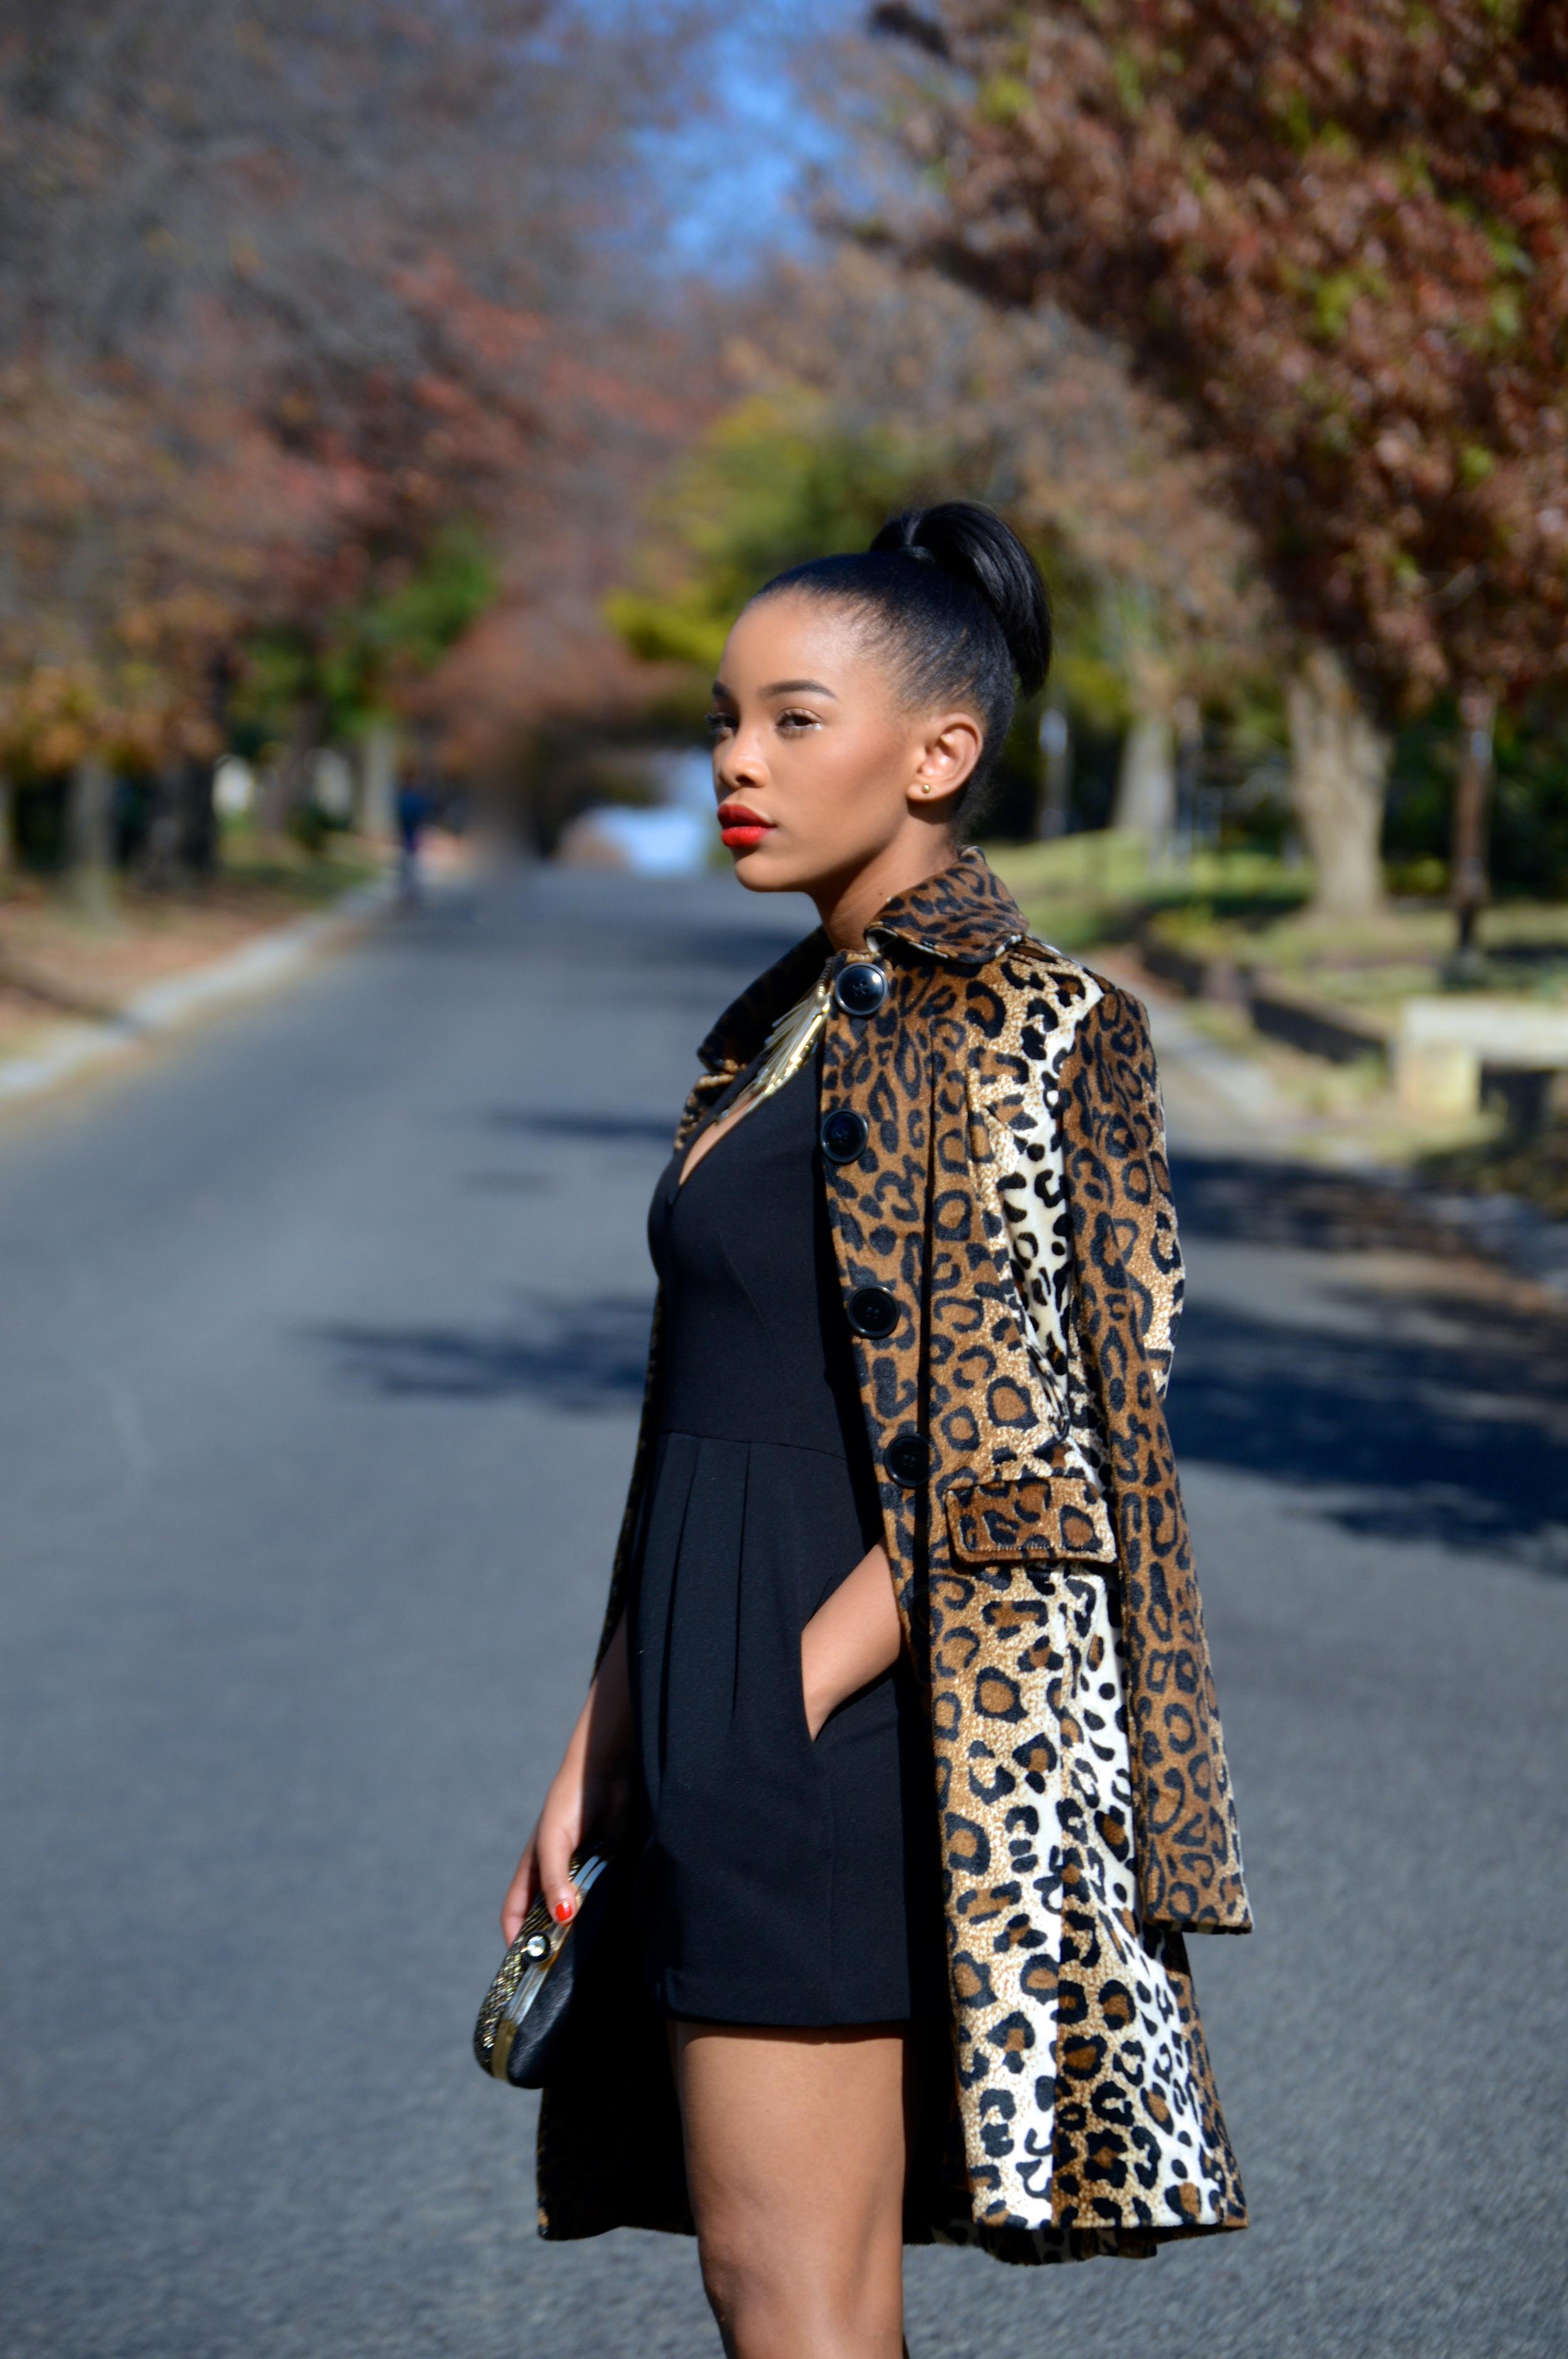 Kaylista_Leopard_15